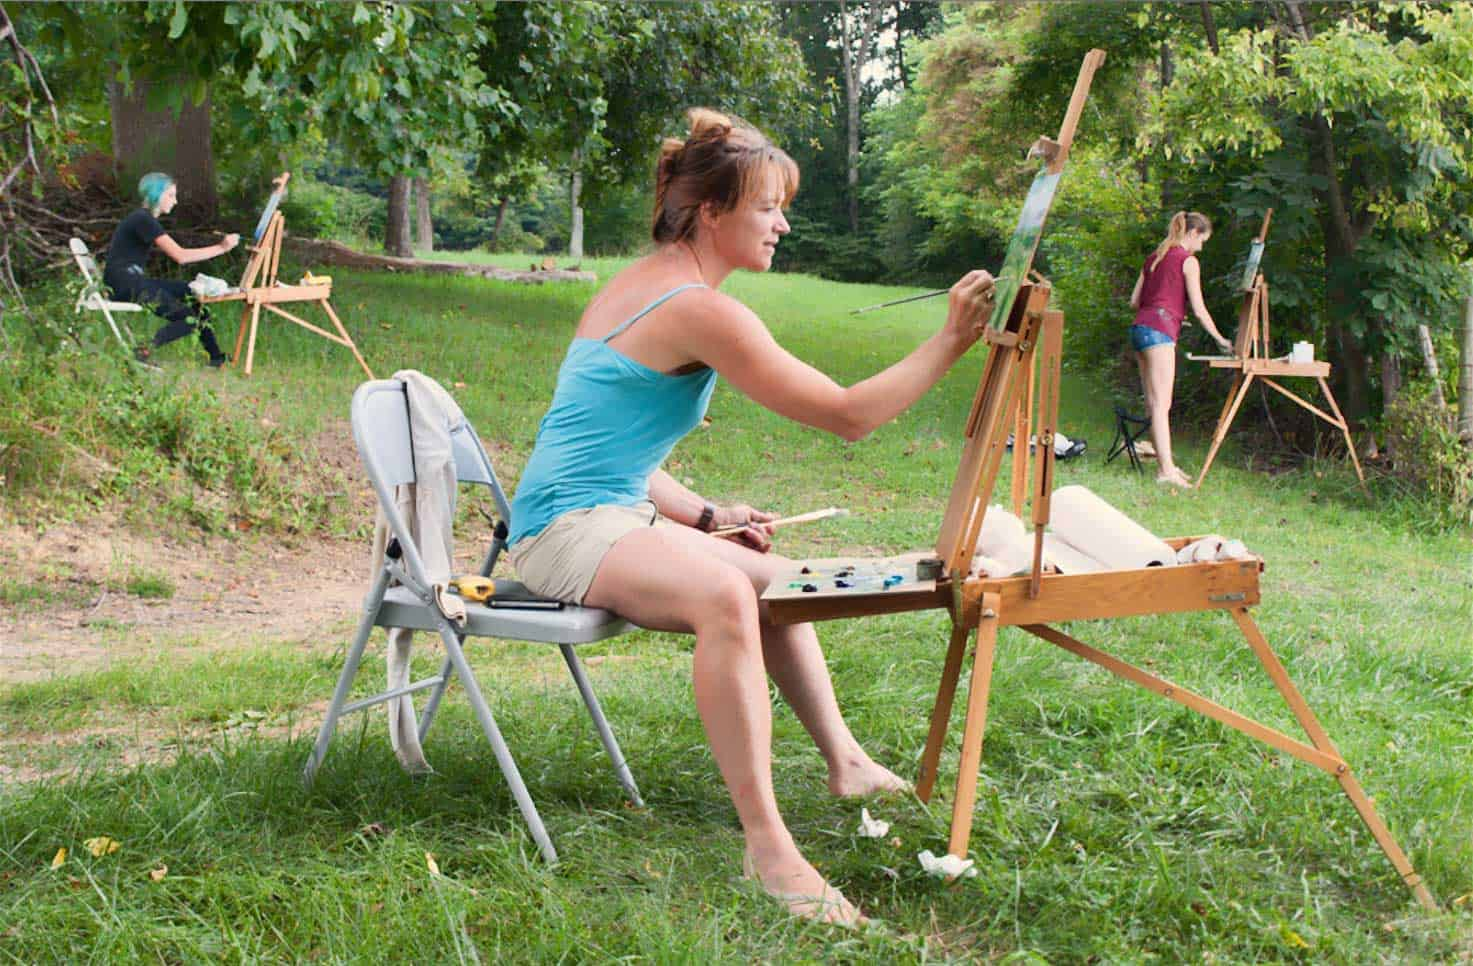 Plein air painting three women